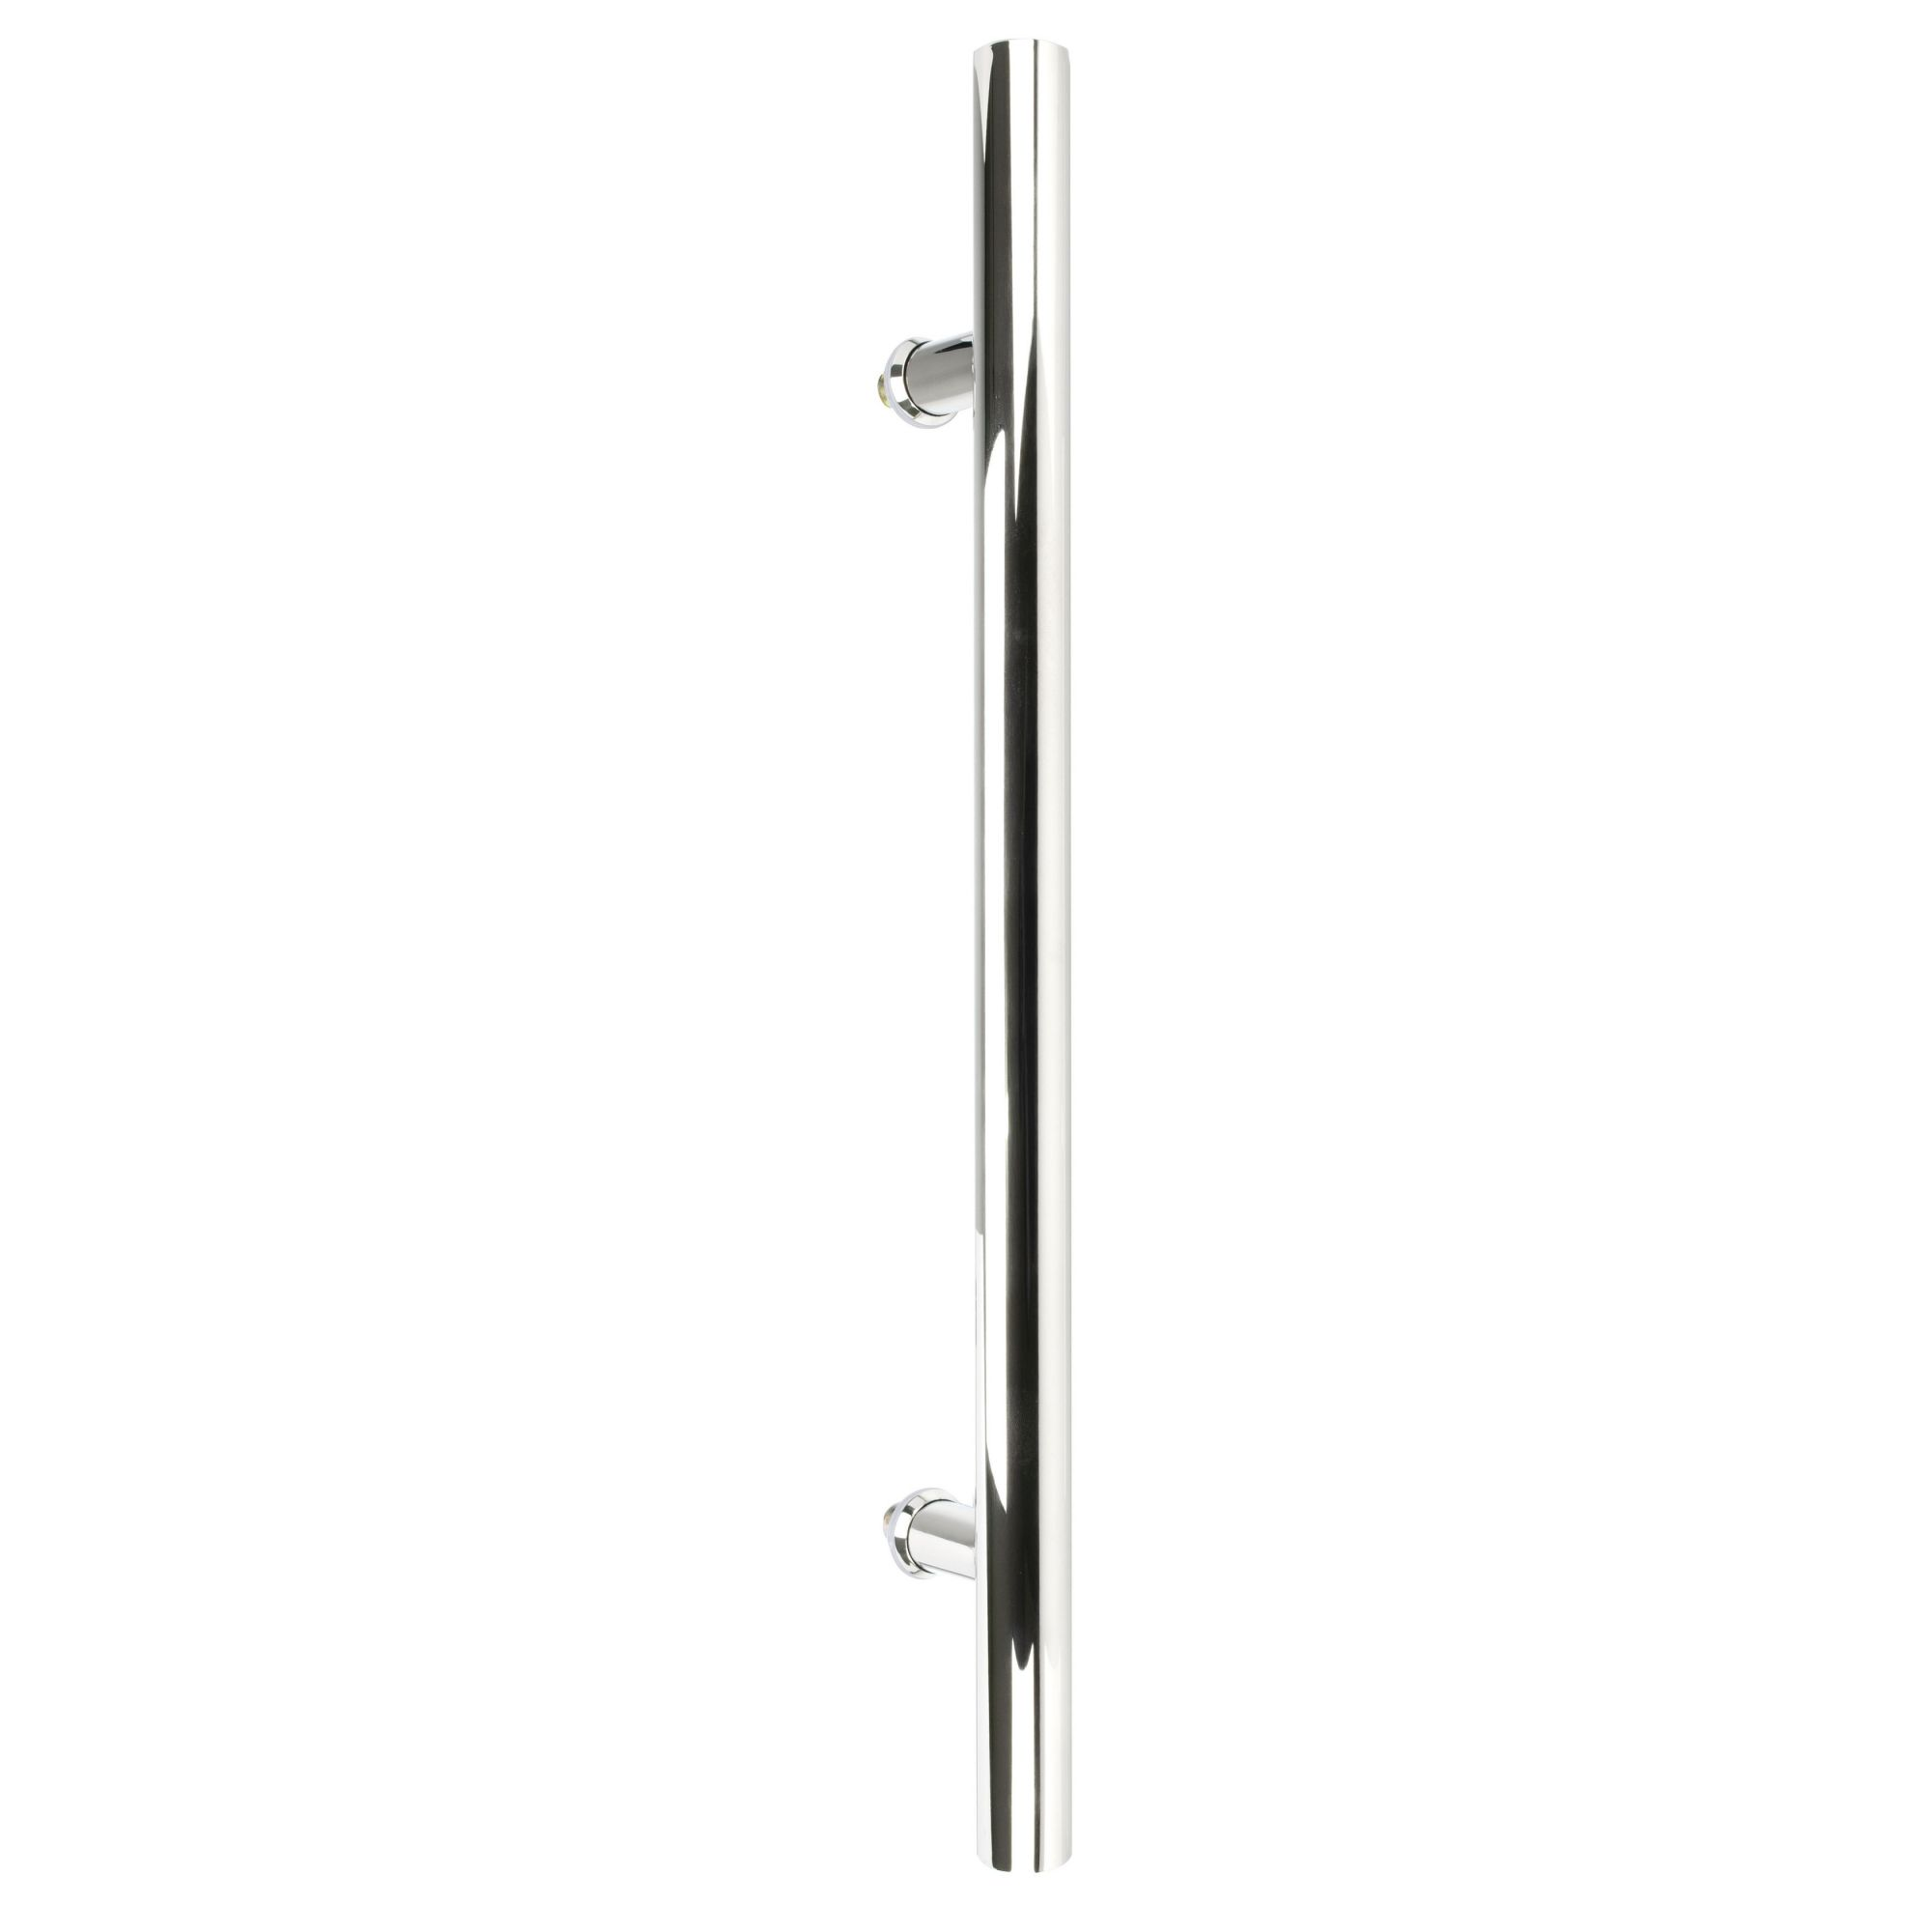 Puxador inox para porta madeira e vidro tubular redondo 900x1,20m H05